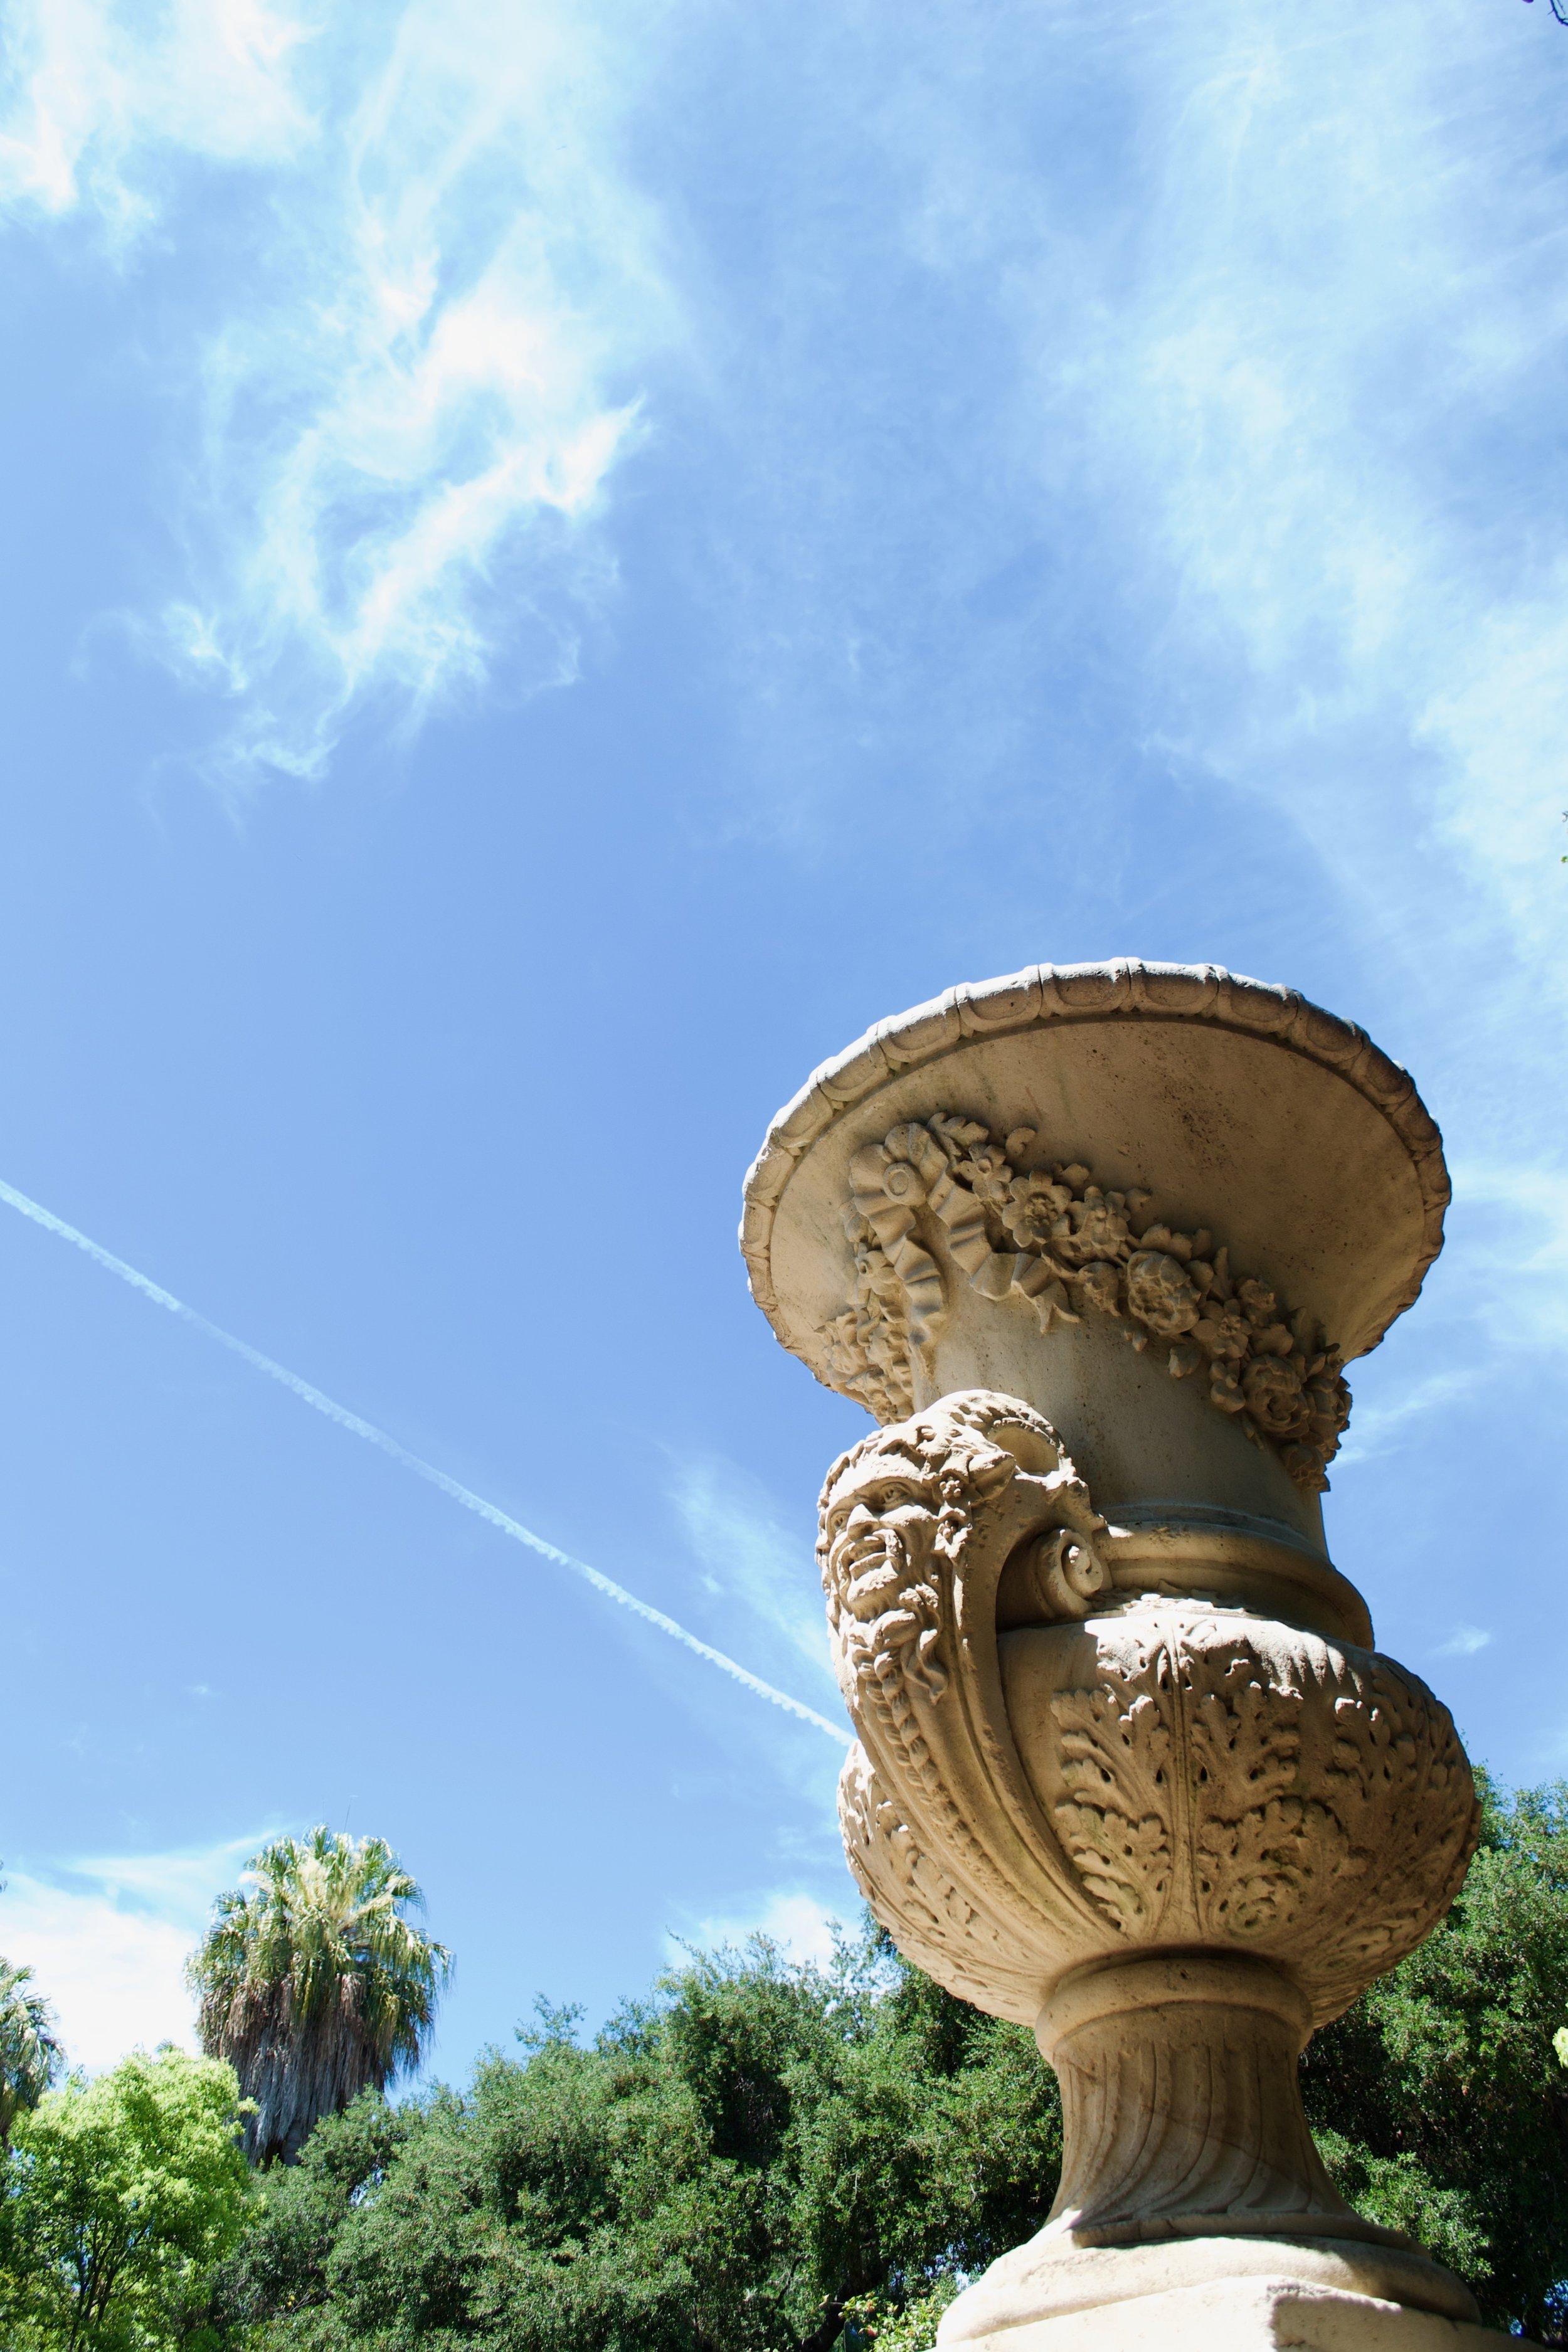 huntington sculpture and sky.jpeg